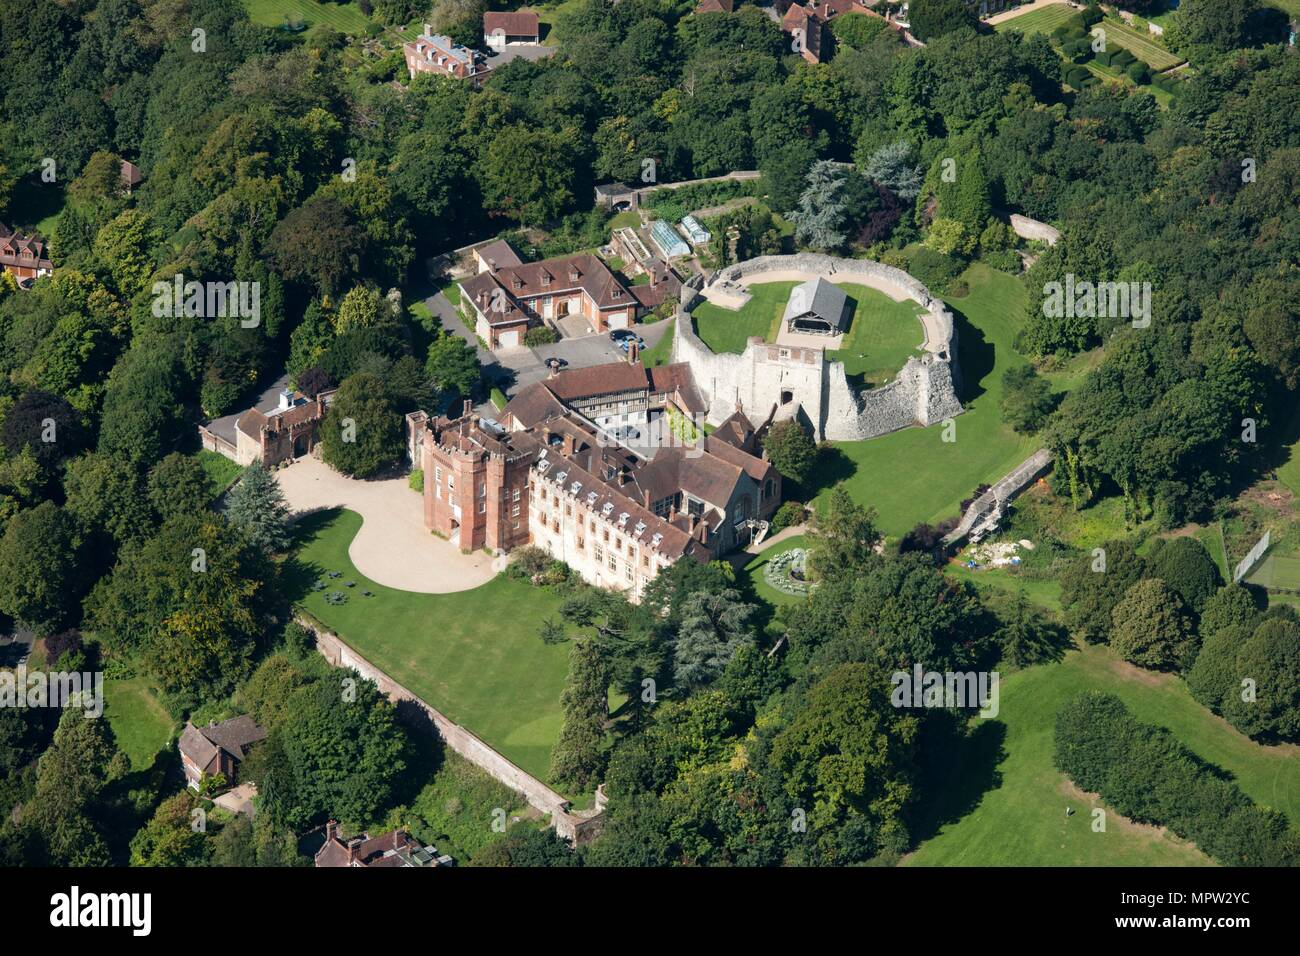 Farnham Castle, Surrey, c2010s(?). Artist: Damian Grady. - Stock Image